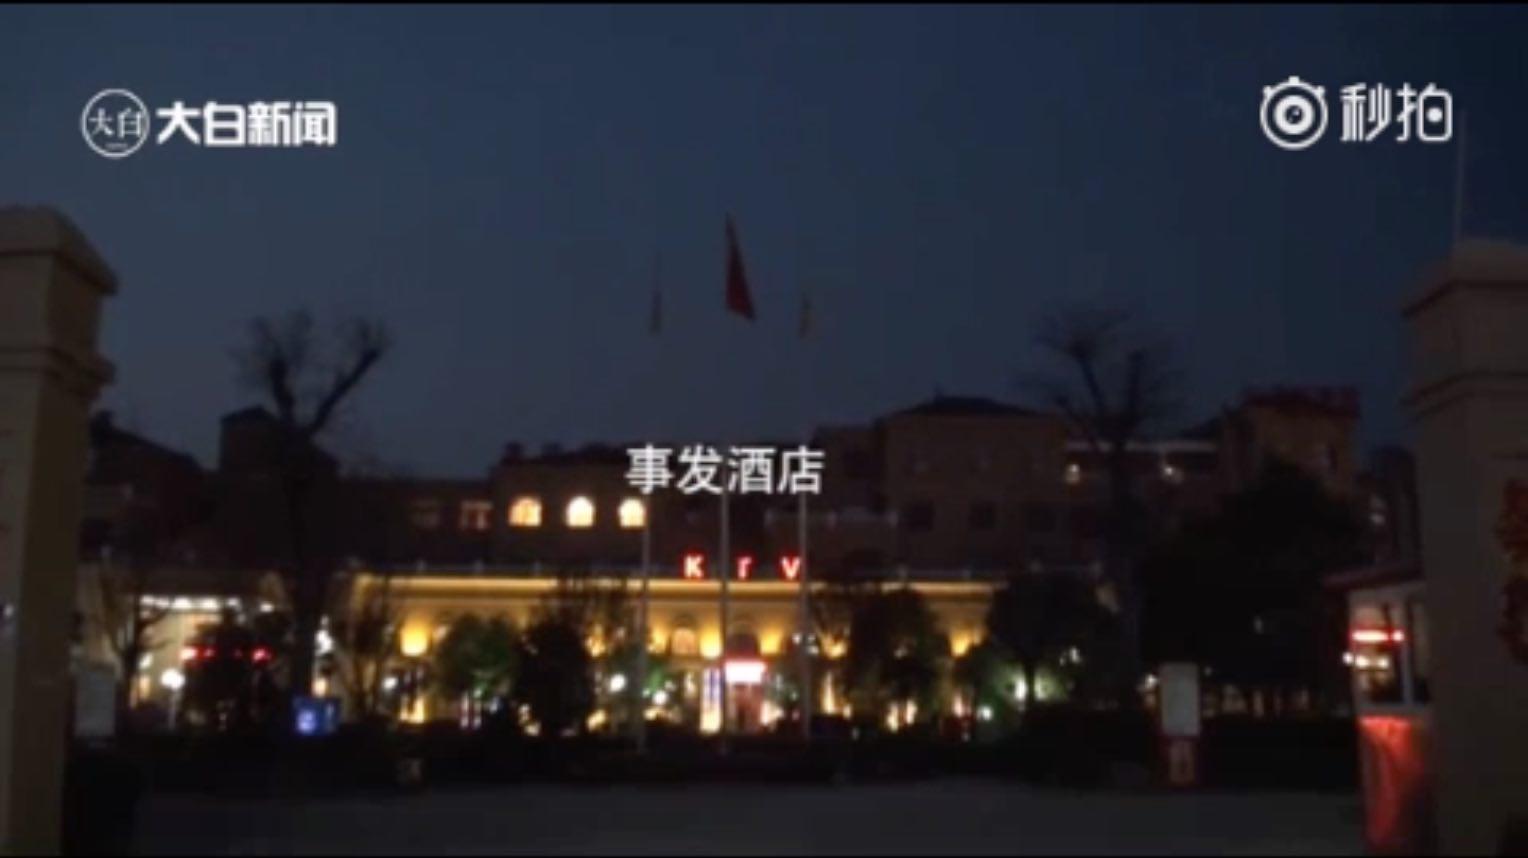 【CDTV】大白新闻|豫30名初中生被胁迫卖淫 疑犯有人大代表